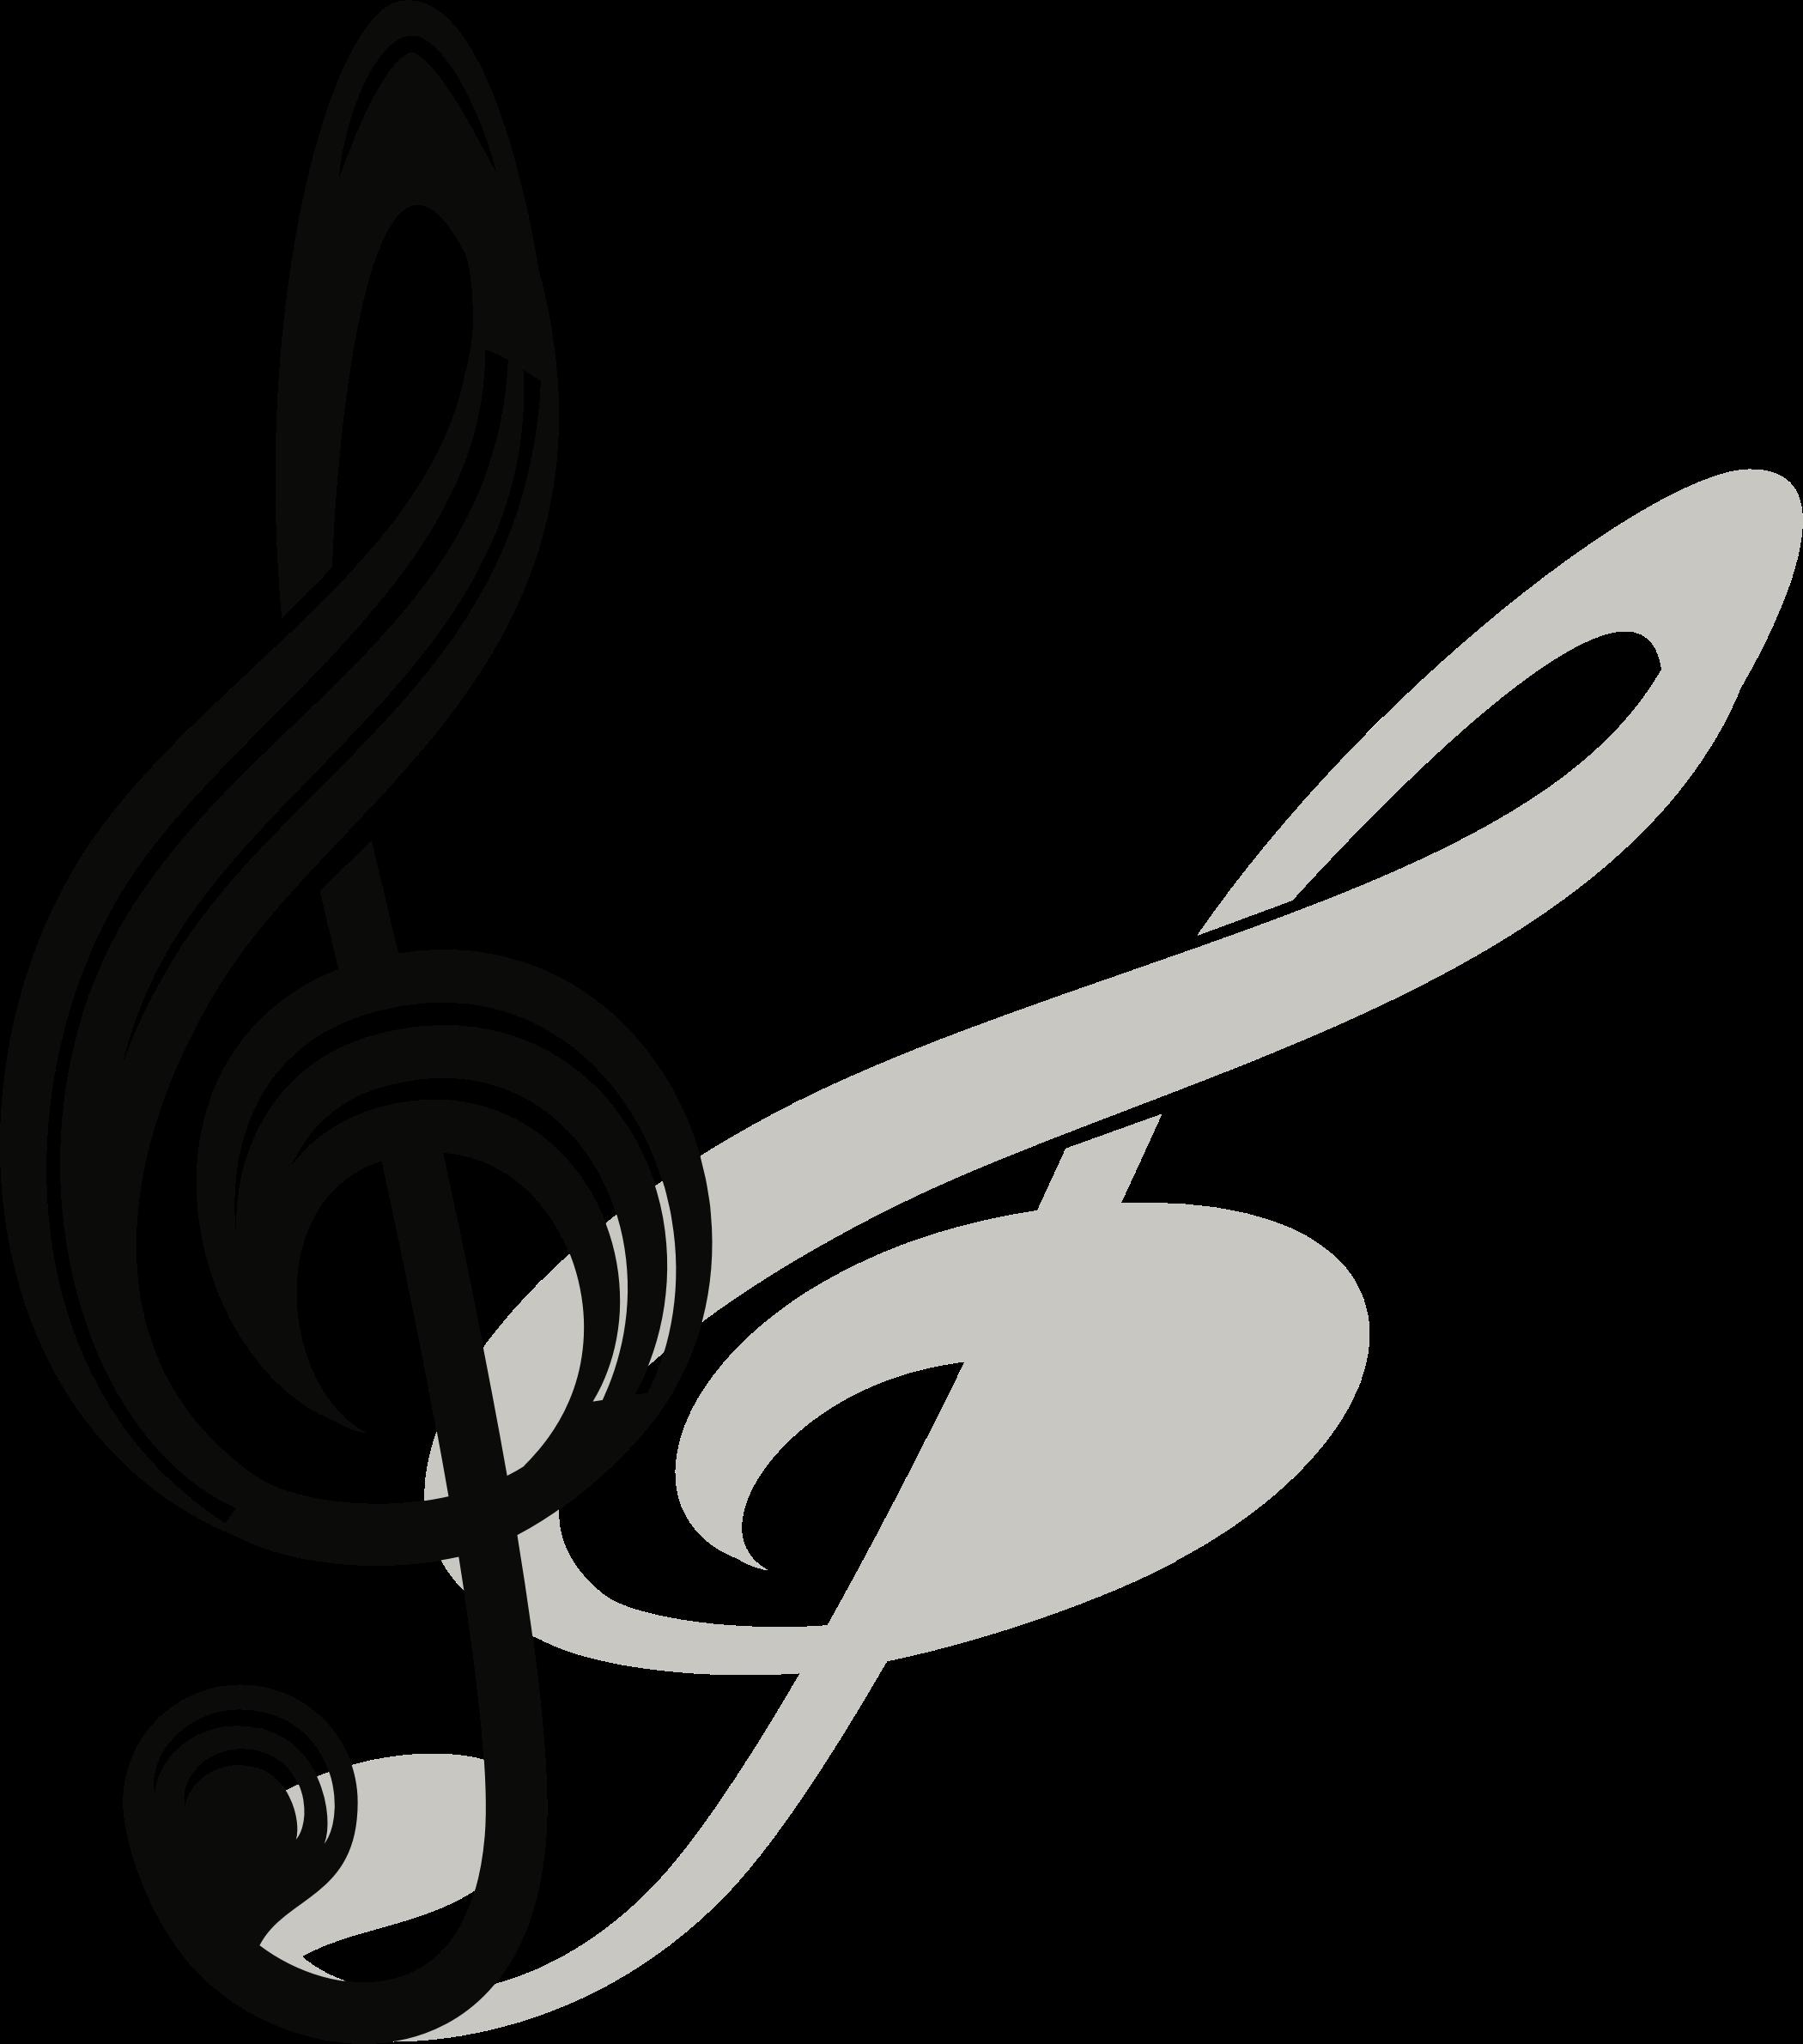 clipart treble clef musical staff clip art music staff clip art transparent background